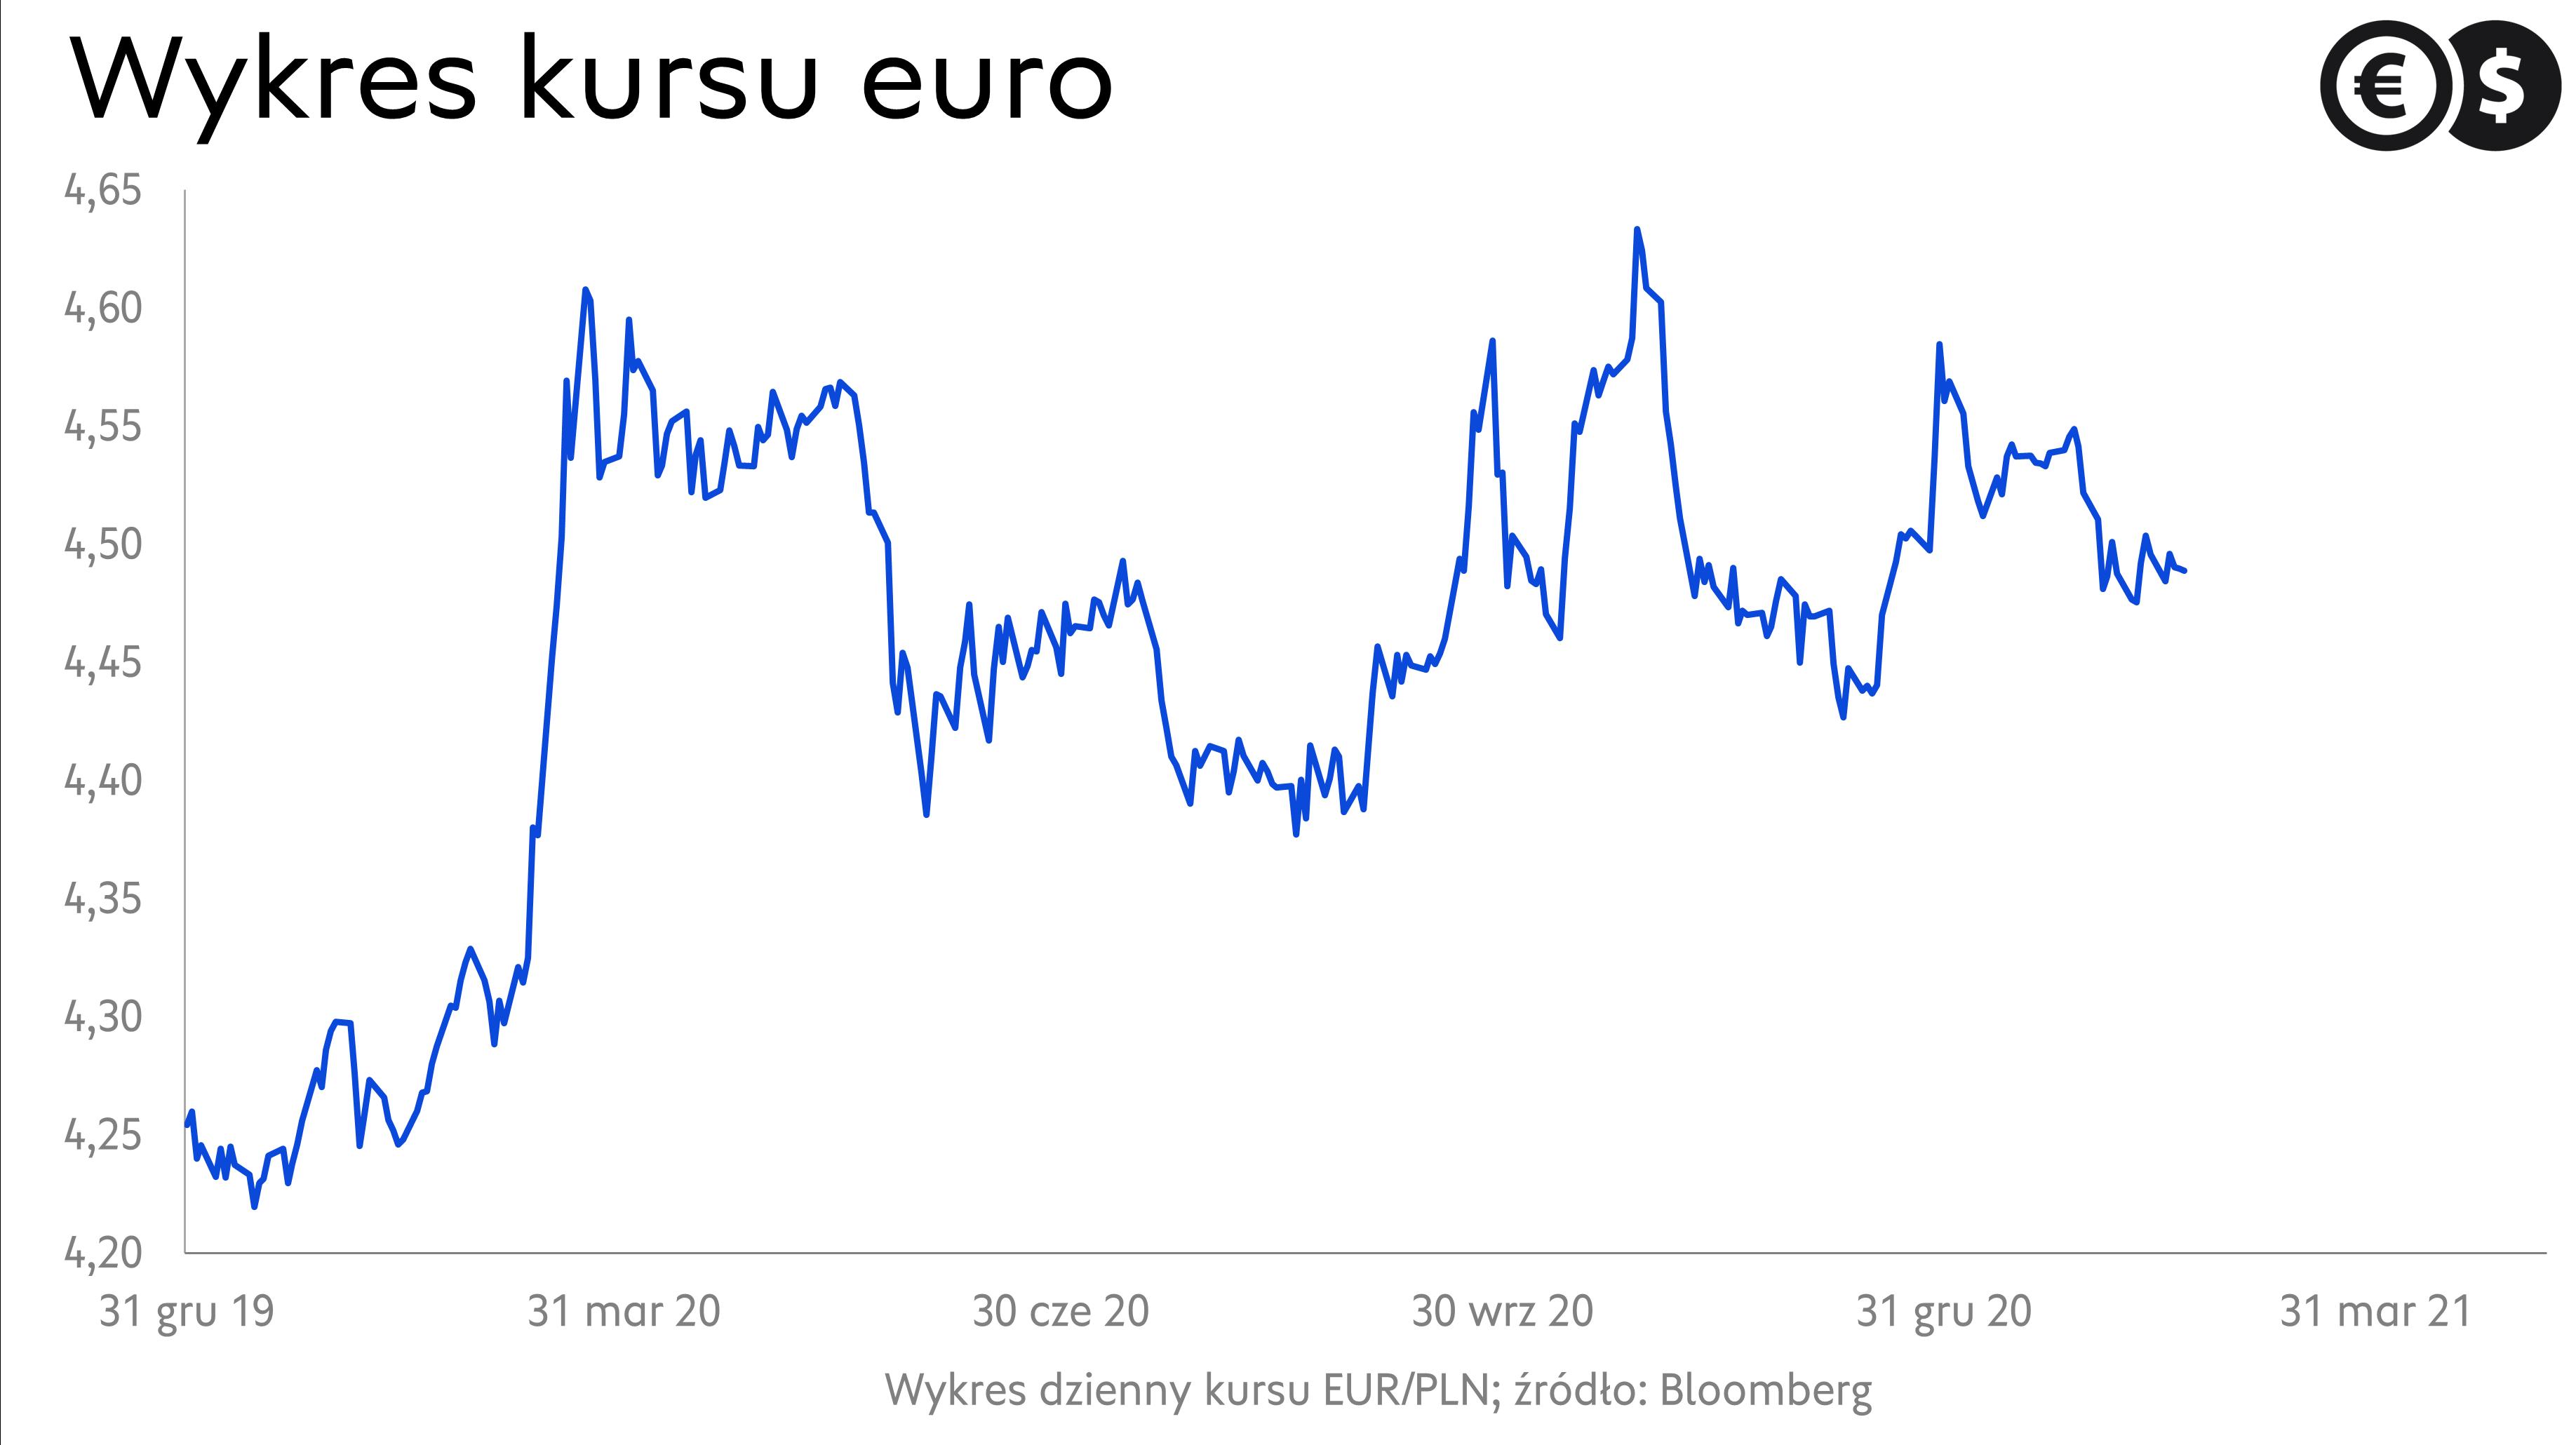 Wykres kursu euro